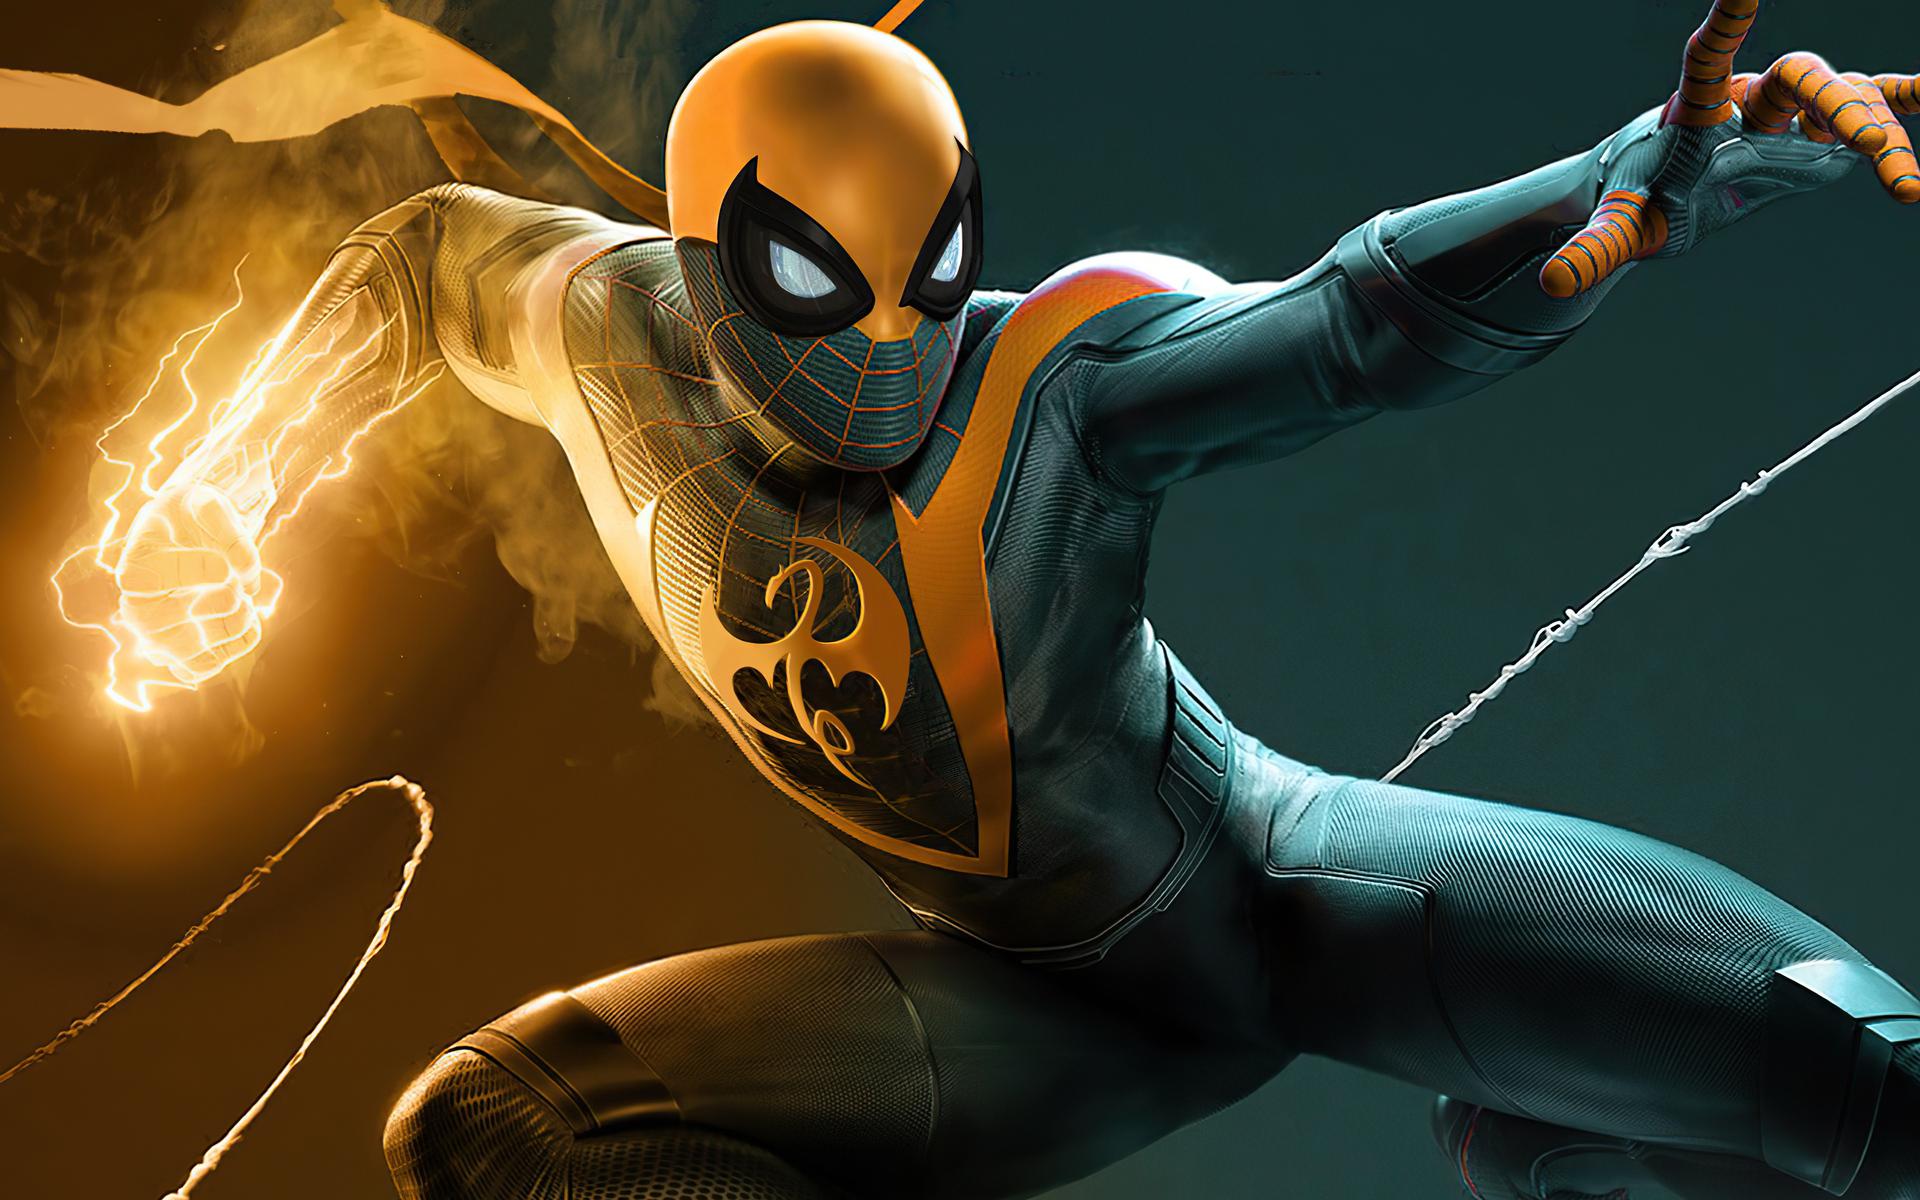 22+ Spider Man Miles Morales Game Hd Wallpaper Images